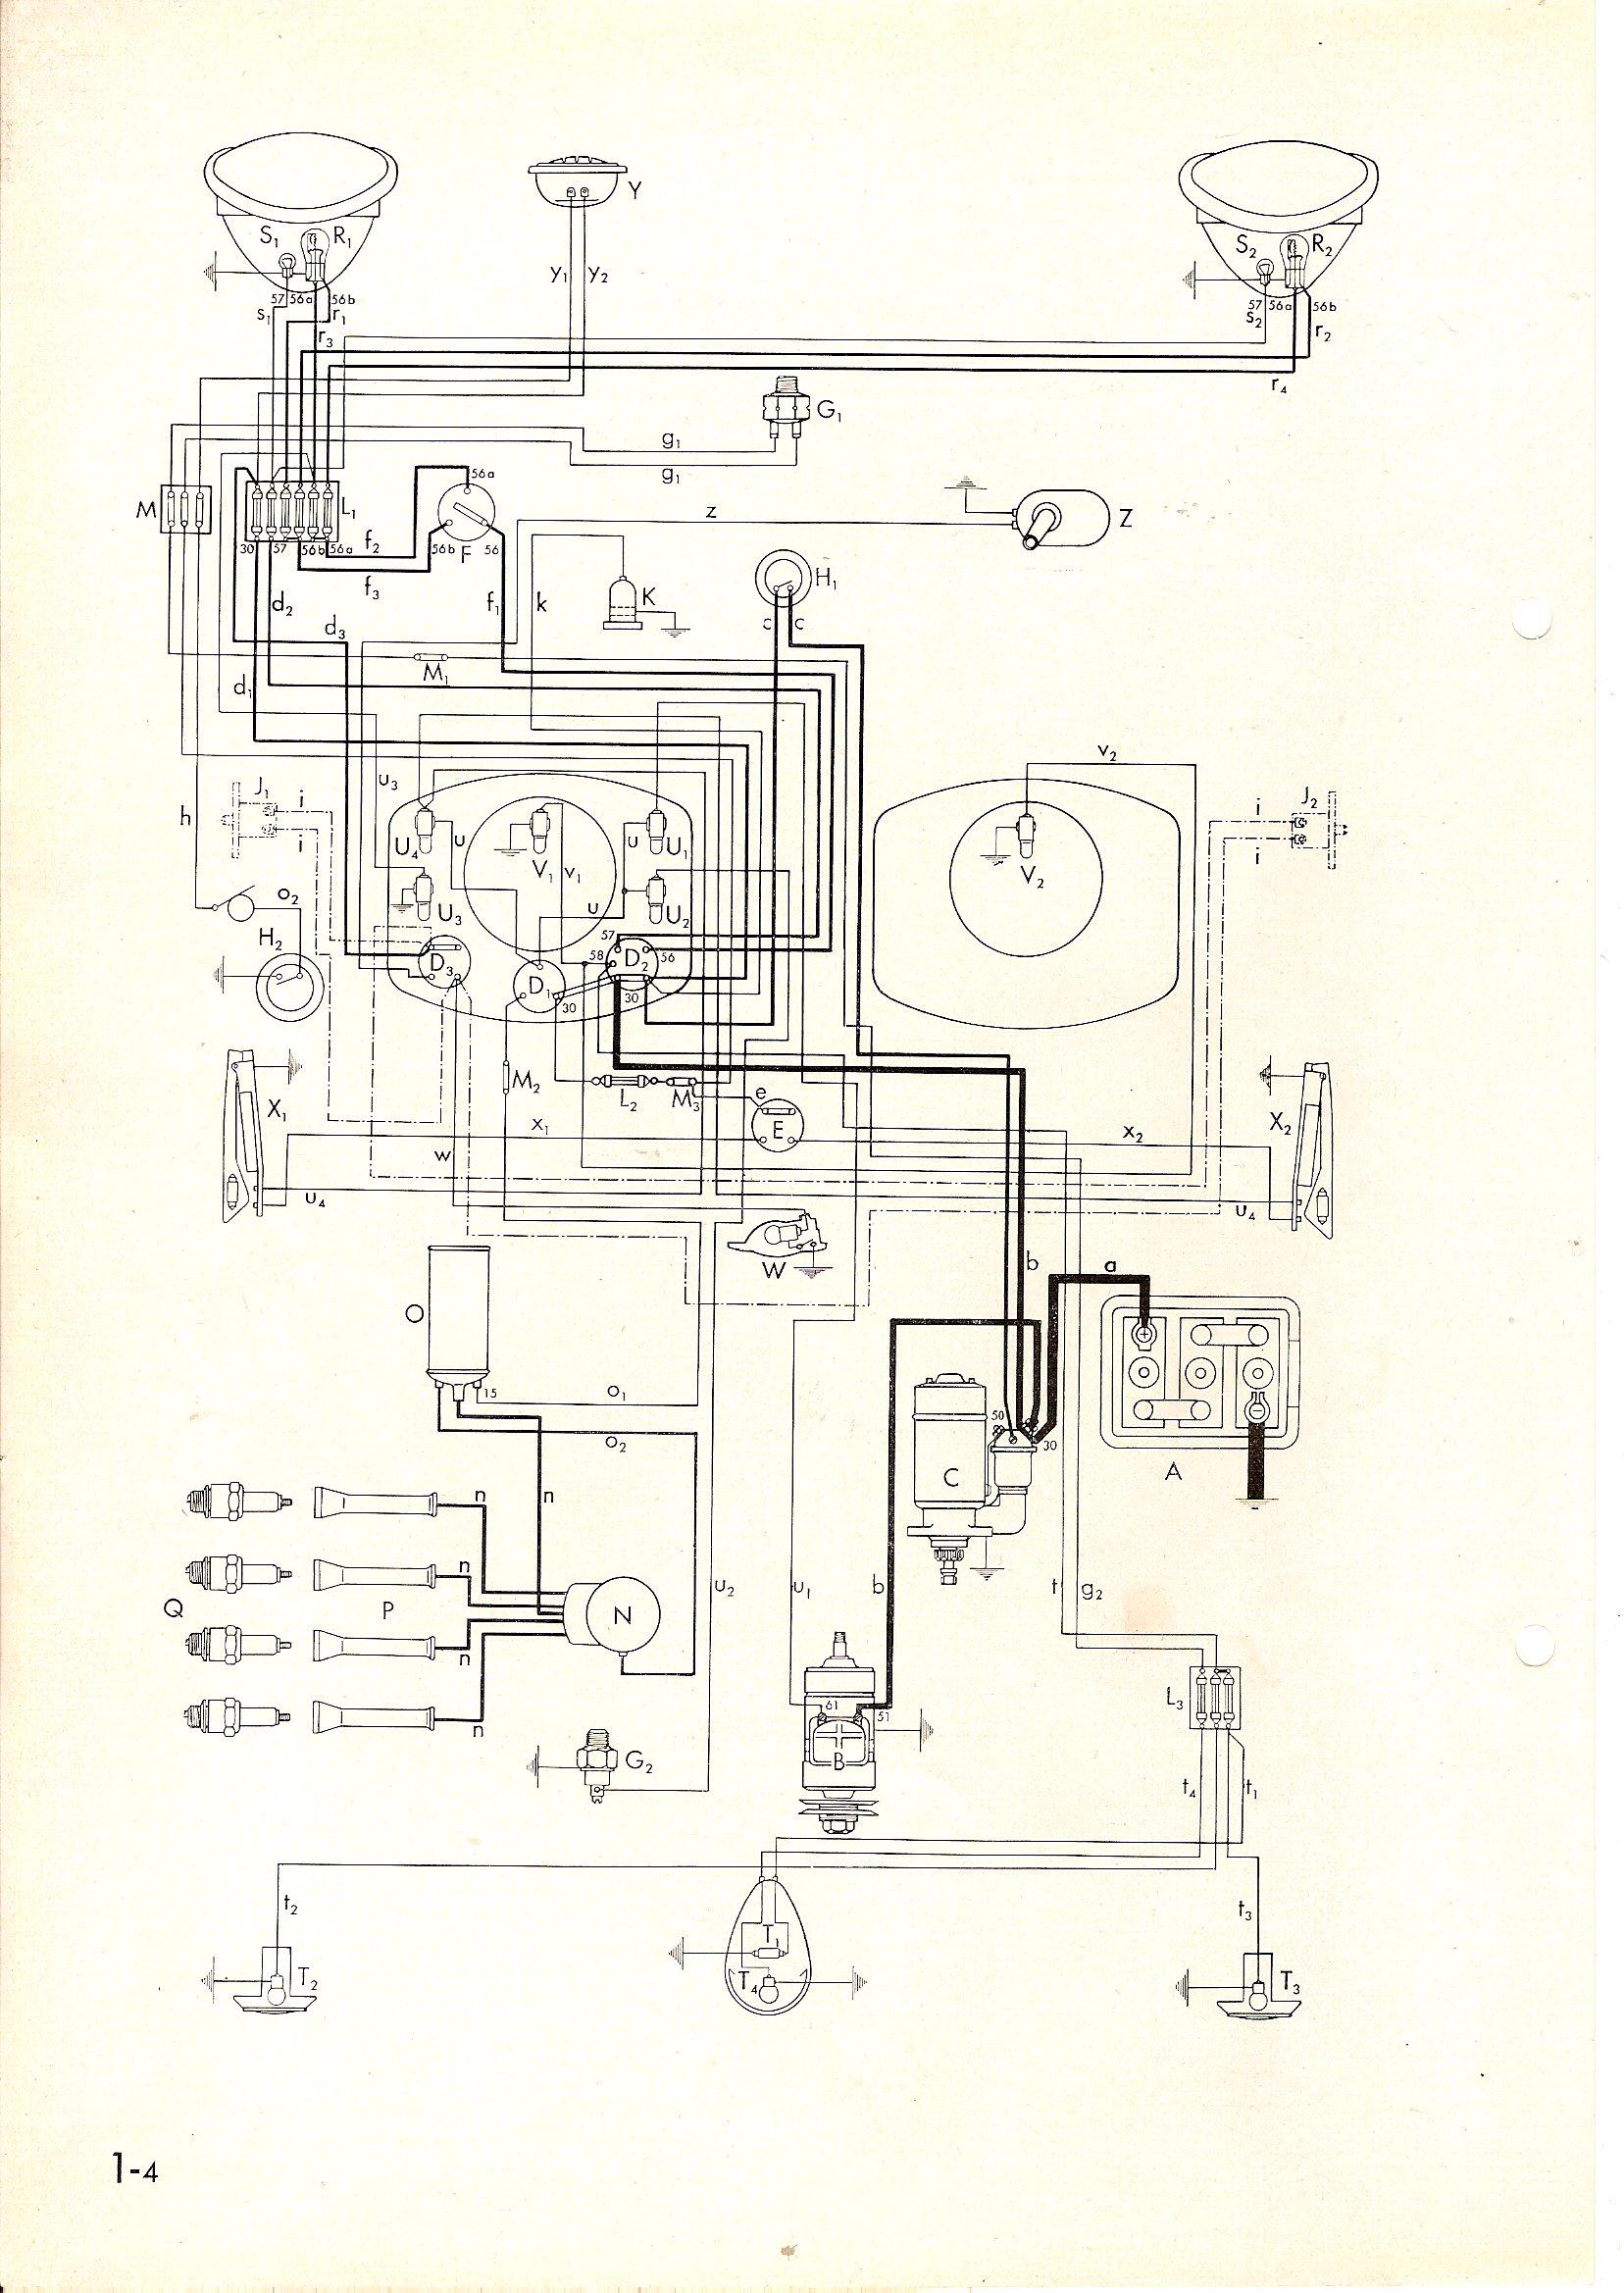 Beetle Fuse Box Diagram Thesamba Com Type 1 Wiring Diagrams